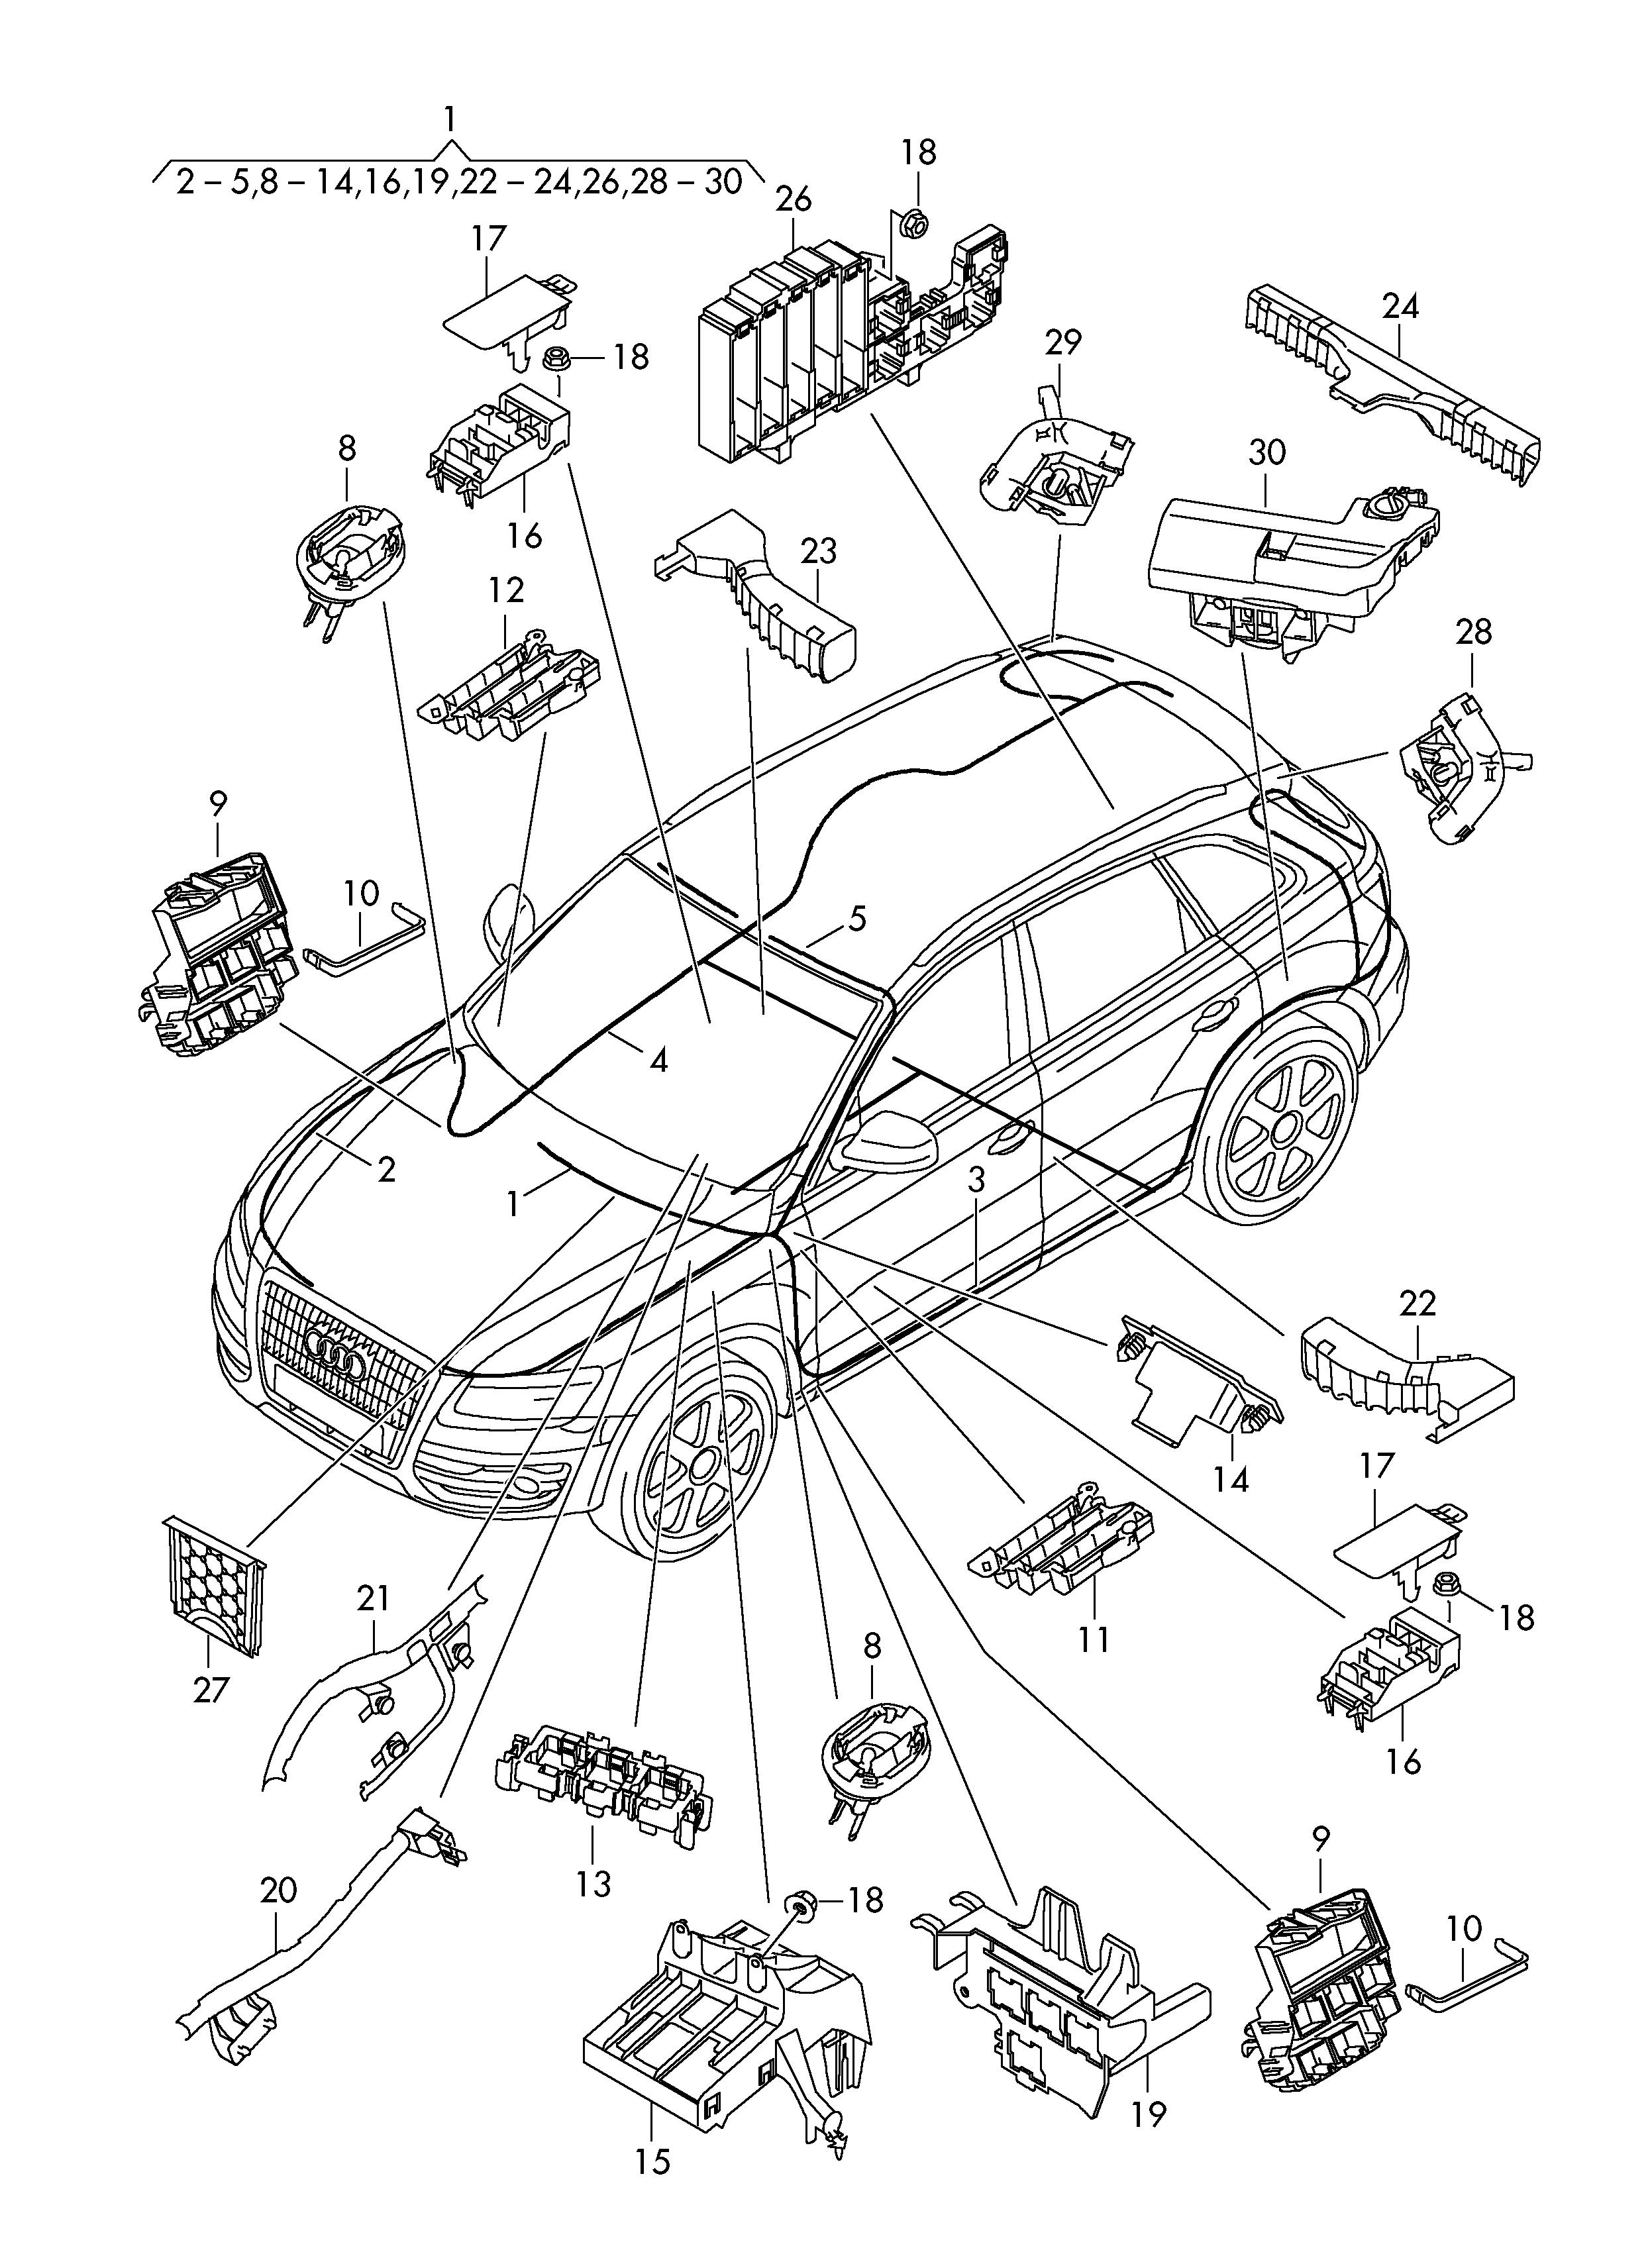 2015 audi q5 engine diagram - wiring diagram lease-setup -  lease-setup.cinemamanzonicasarano.it  cinemamanzonicasarano.it